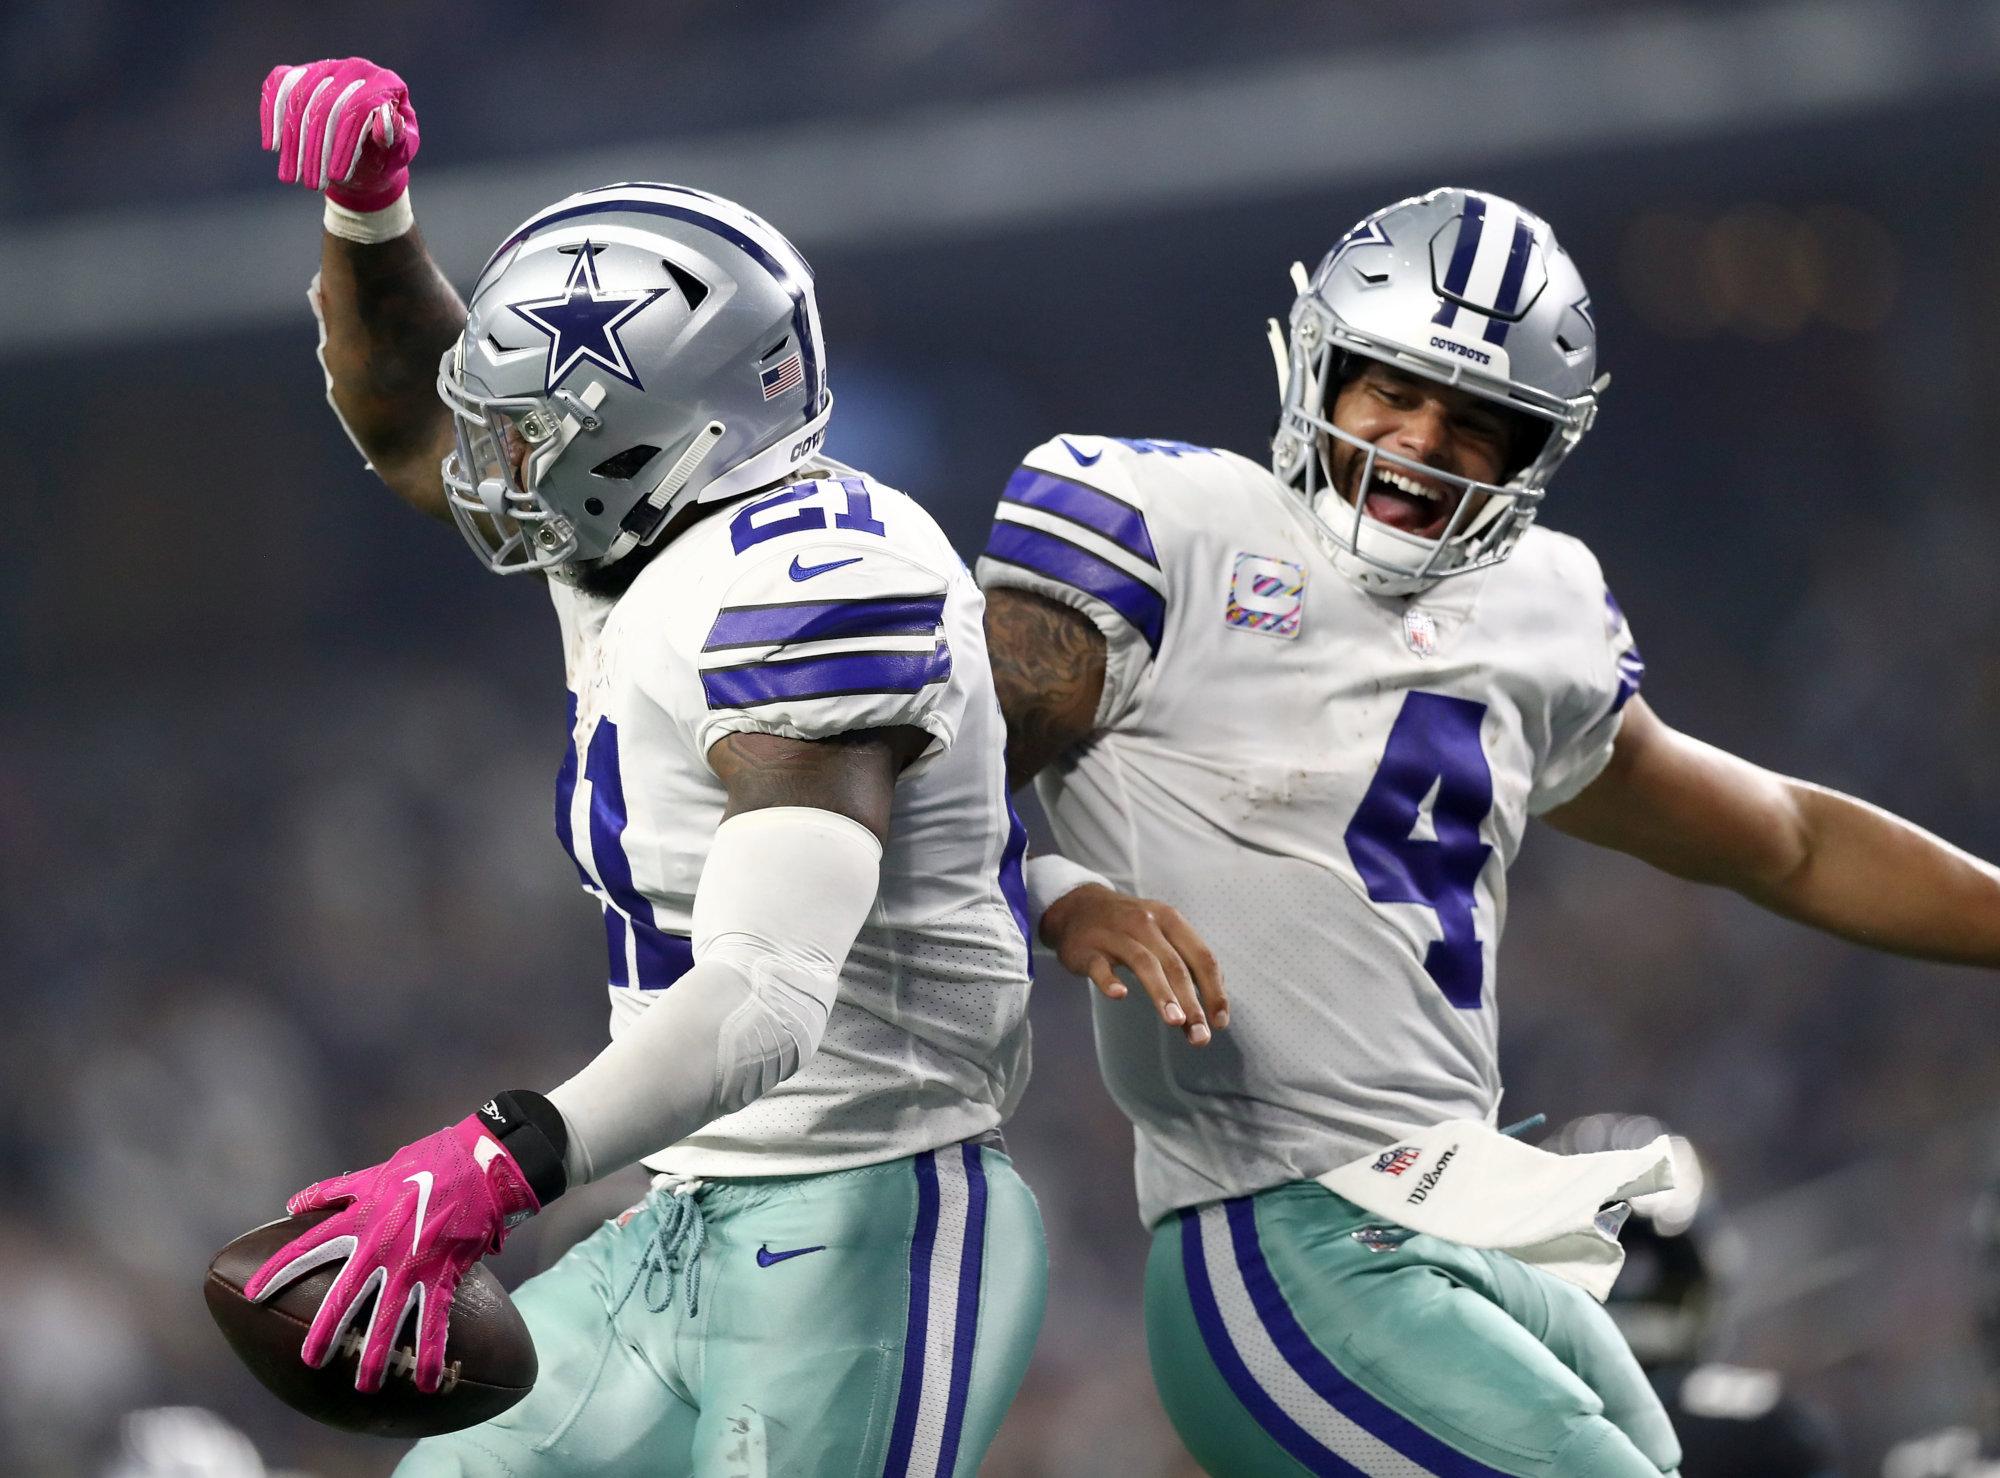 ARLINGTON, TX - OCTOBER 14:  Ezekiel Elliott #21 and Dak Prescott #4 of the Dallas Cowboys celebrate the fourth quarter touchdown against the Jacksonville Jaguars at AT&T Stadium on October 14, 2018 in Arlington, Texas.  (Photo by Ronald Martinez/Getty Images)